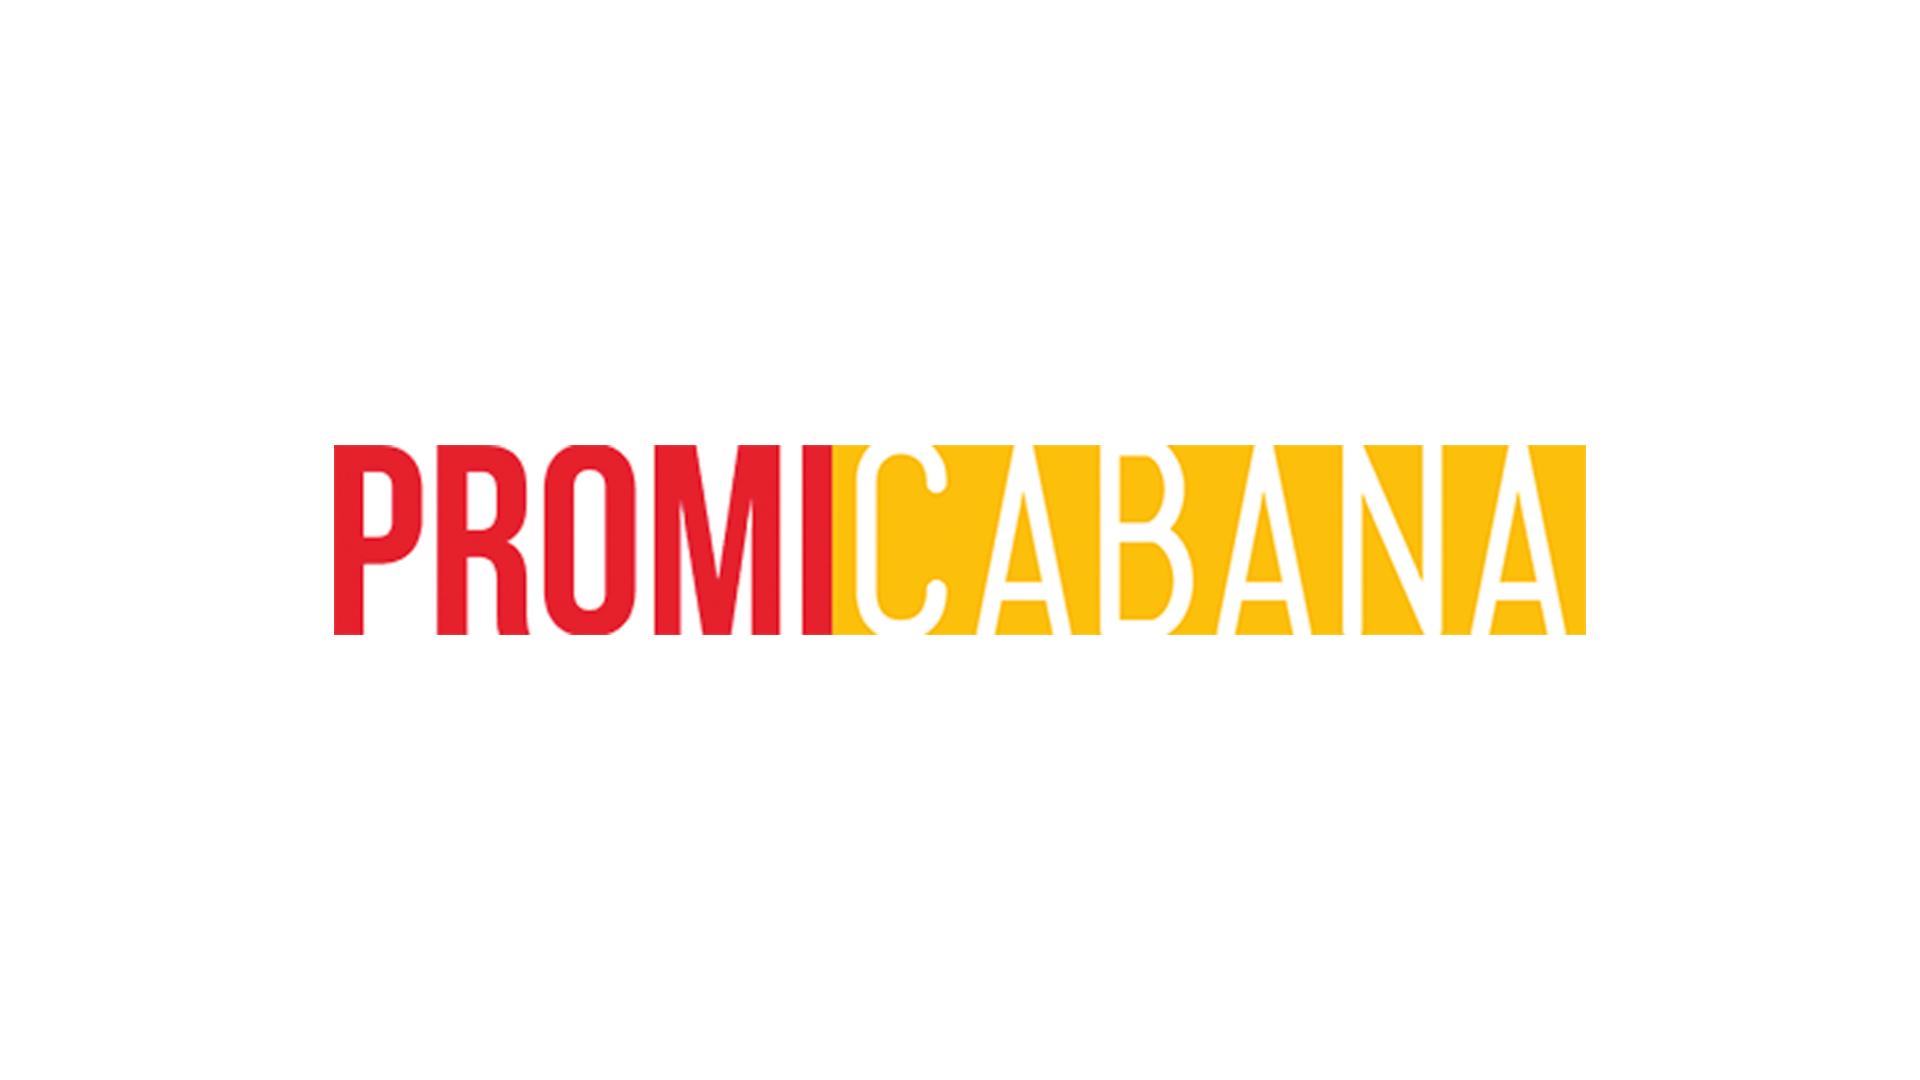 Chris-Hemsworth-Jimmy-Fallon-feucht